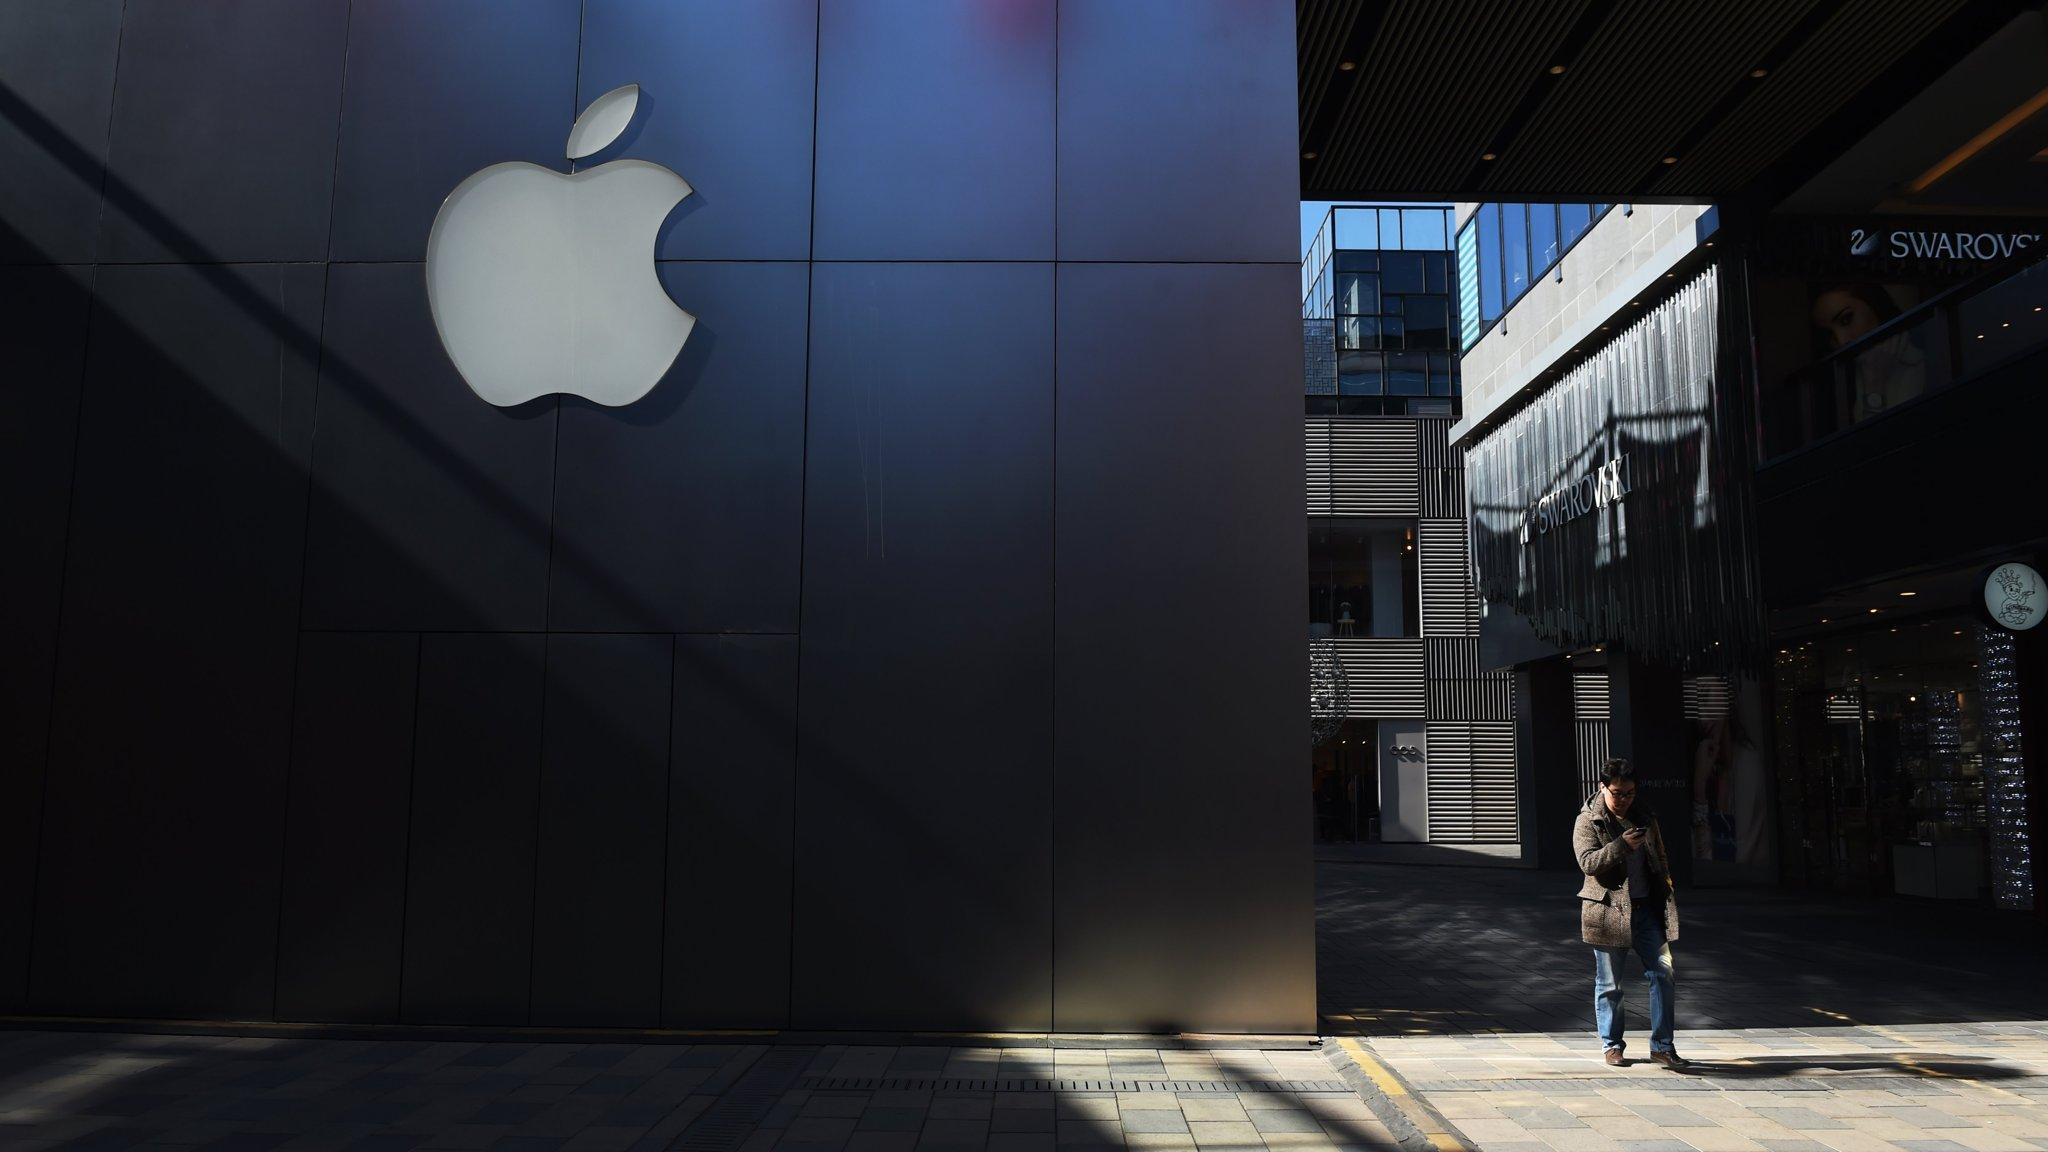 apple fdi in china